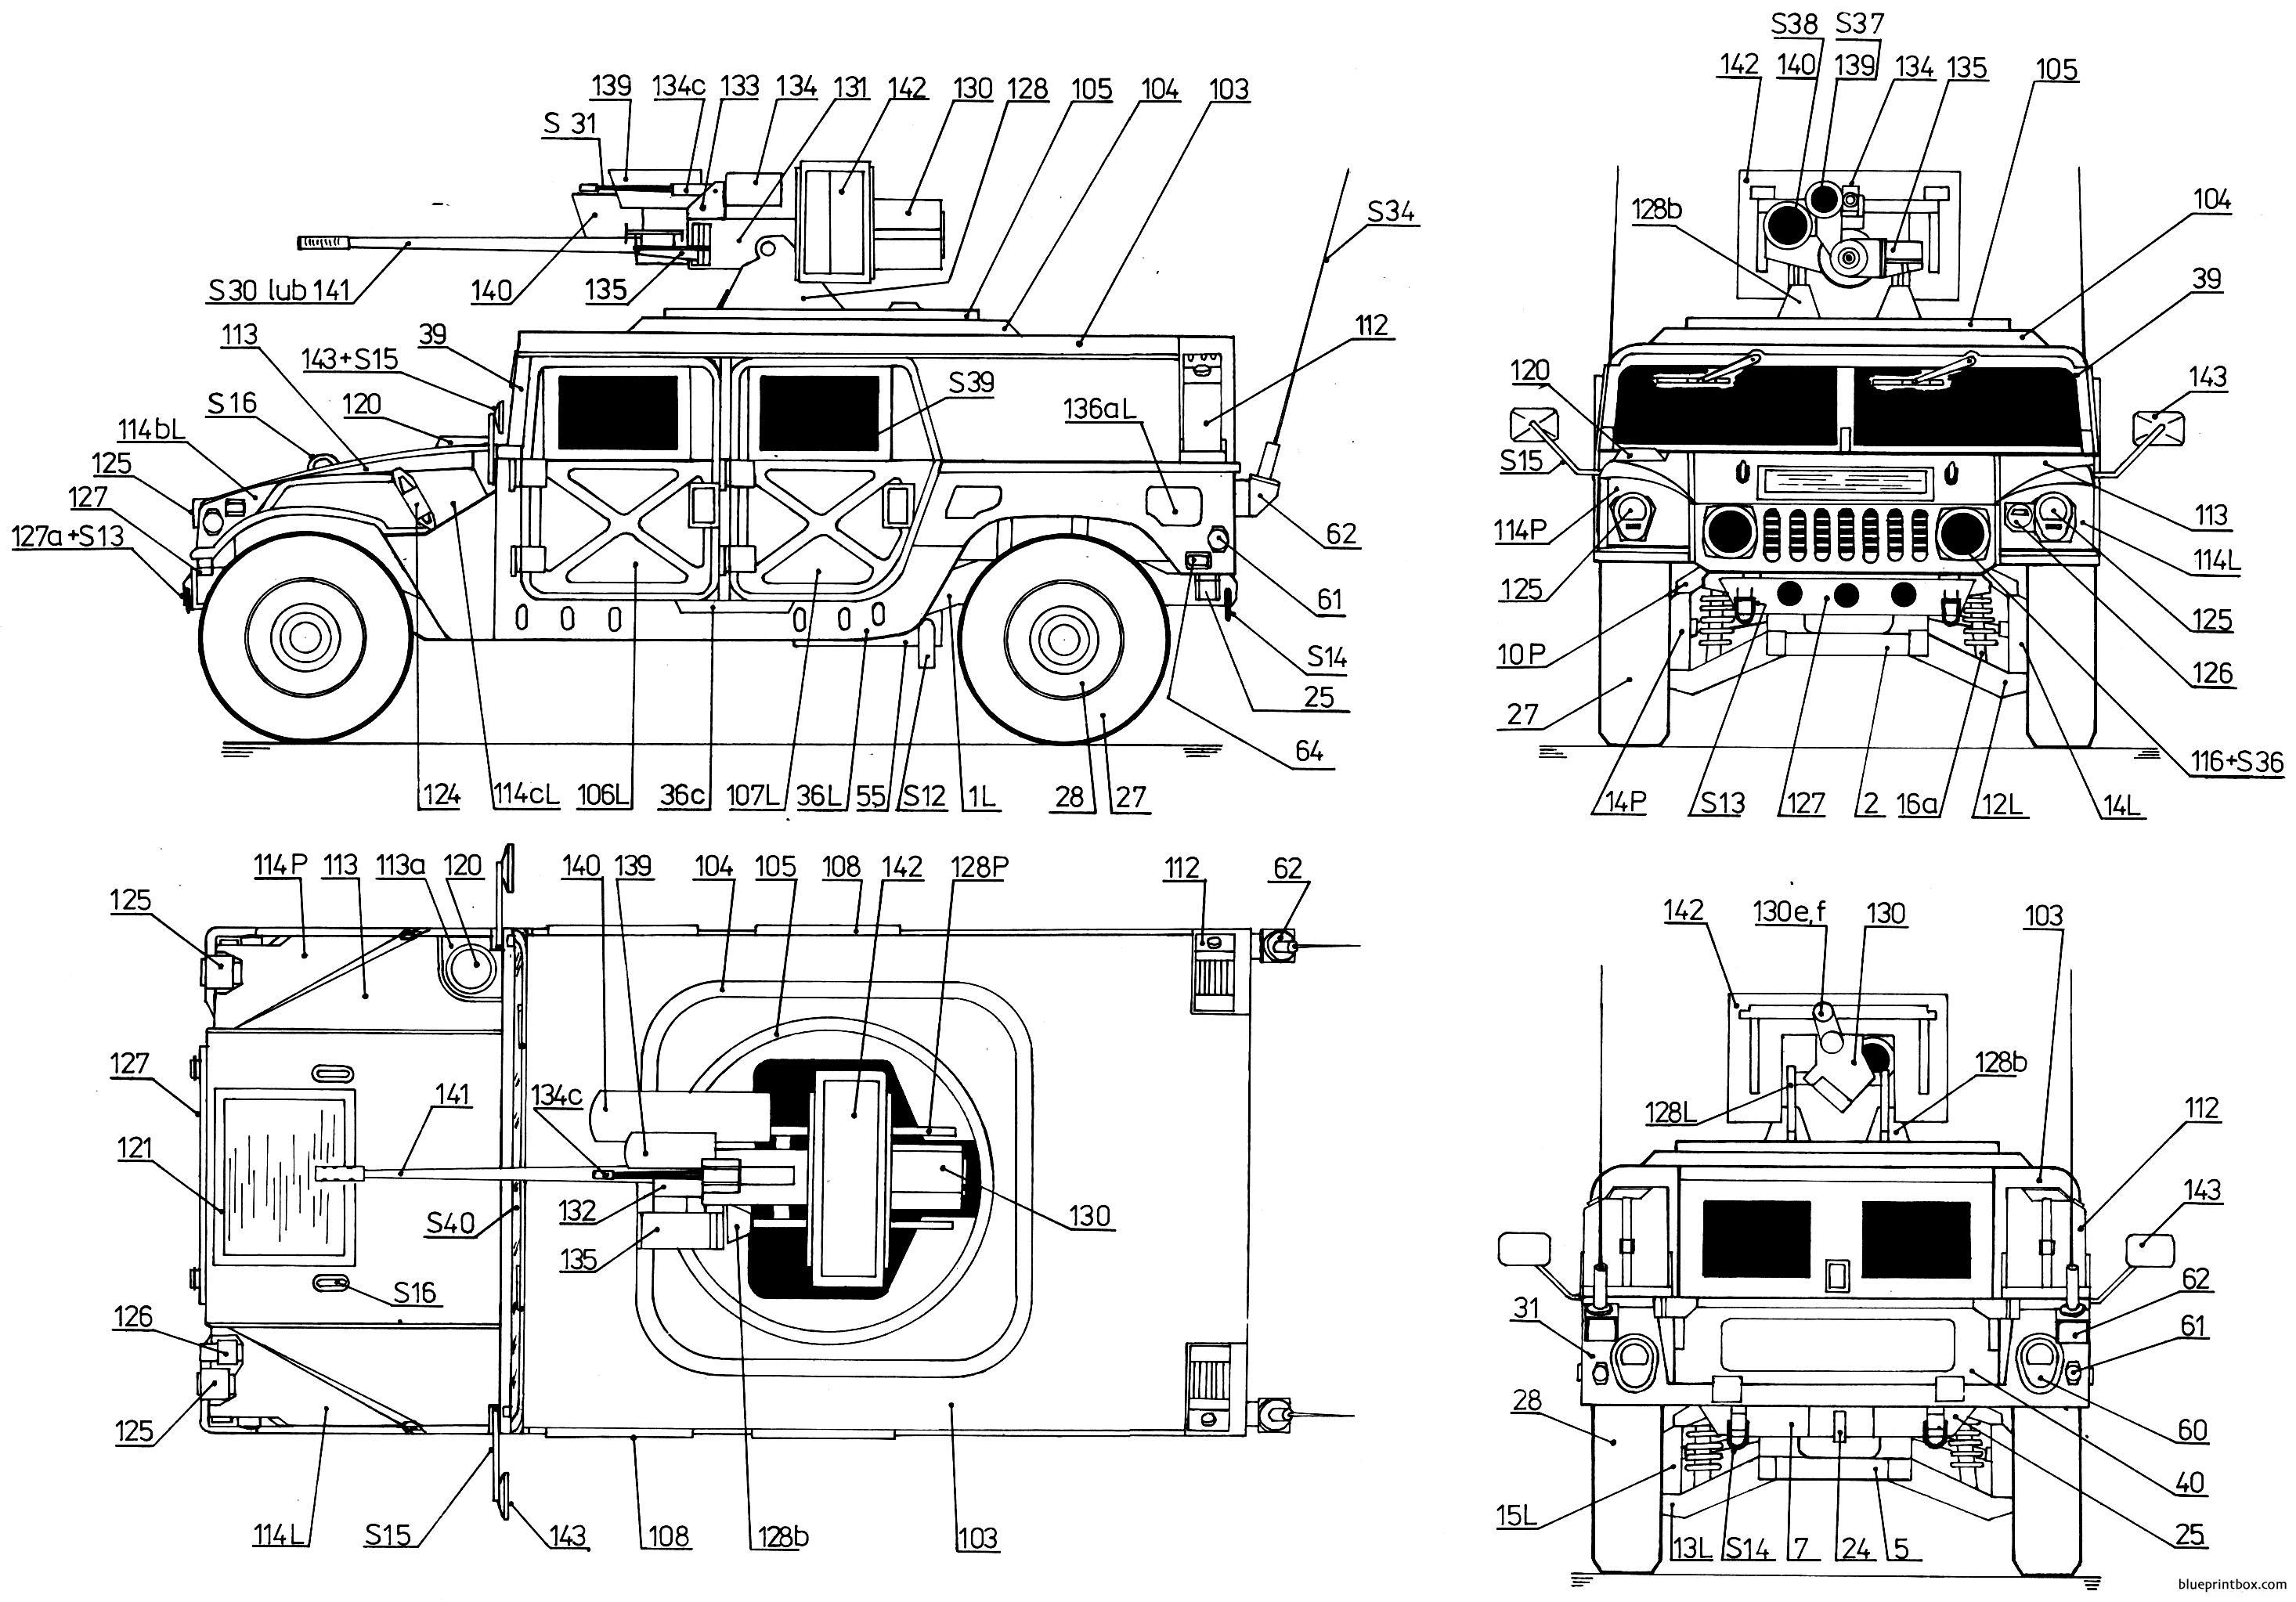 Hummer M242 Bushmaster 2